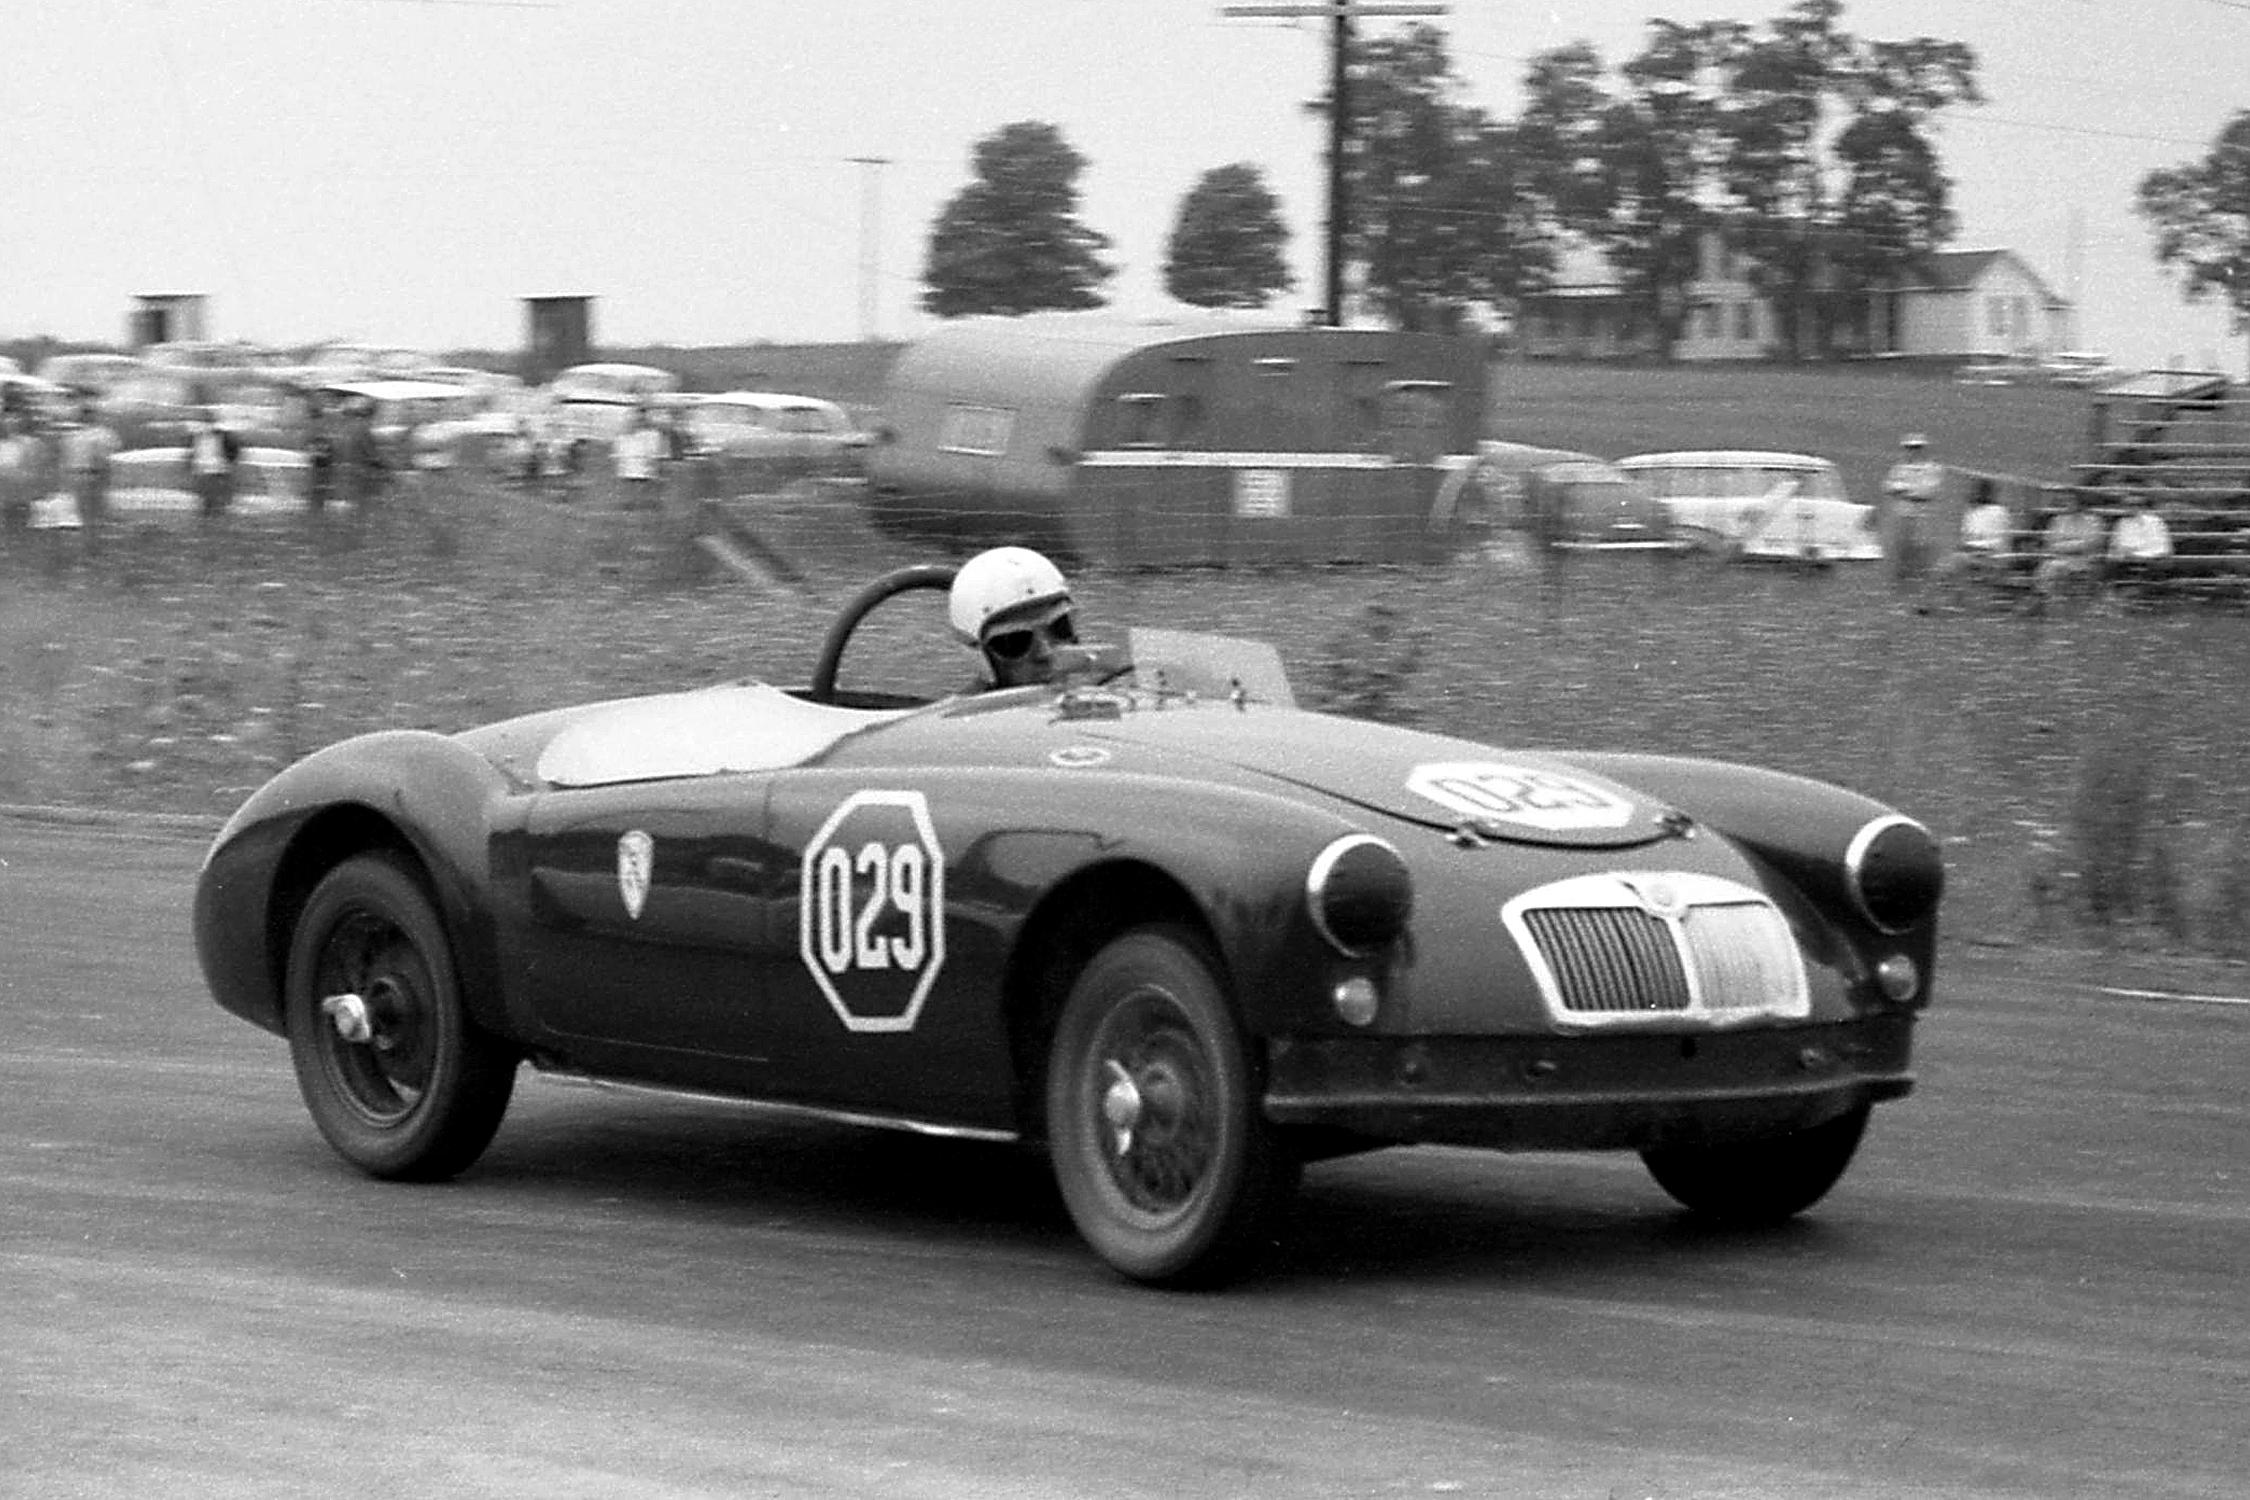 1959 MG Car Club races